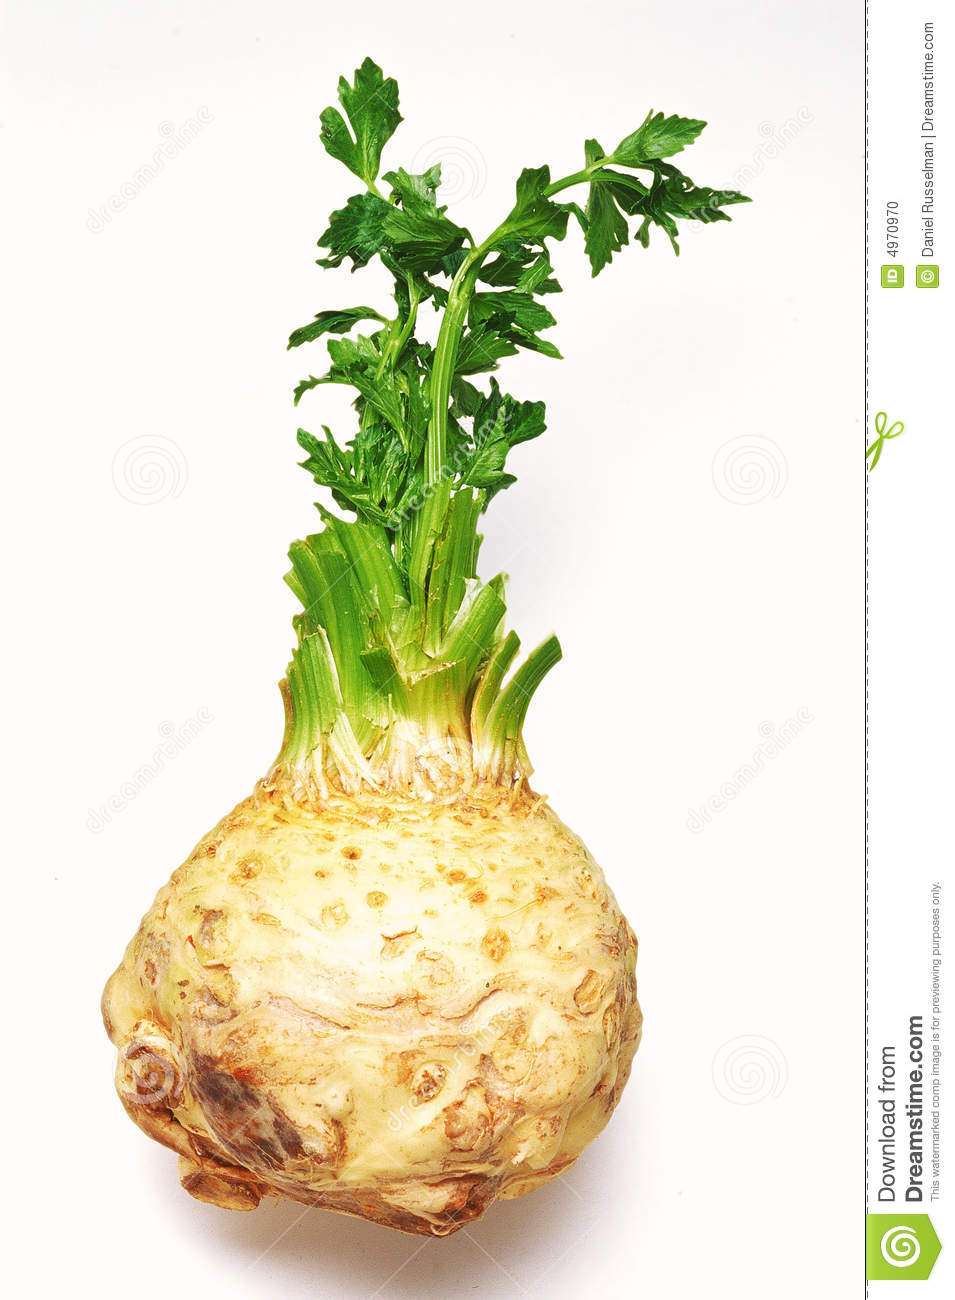 Celeriac clipart.